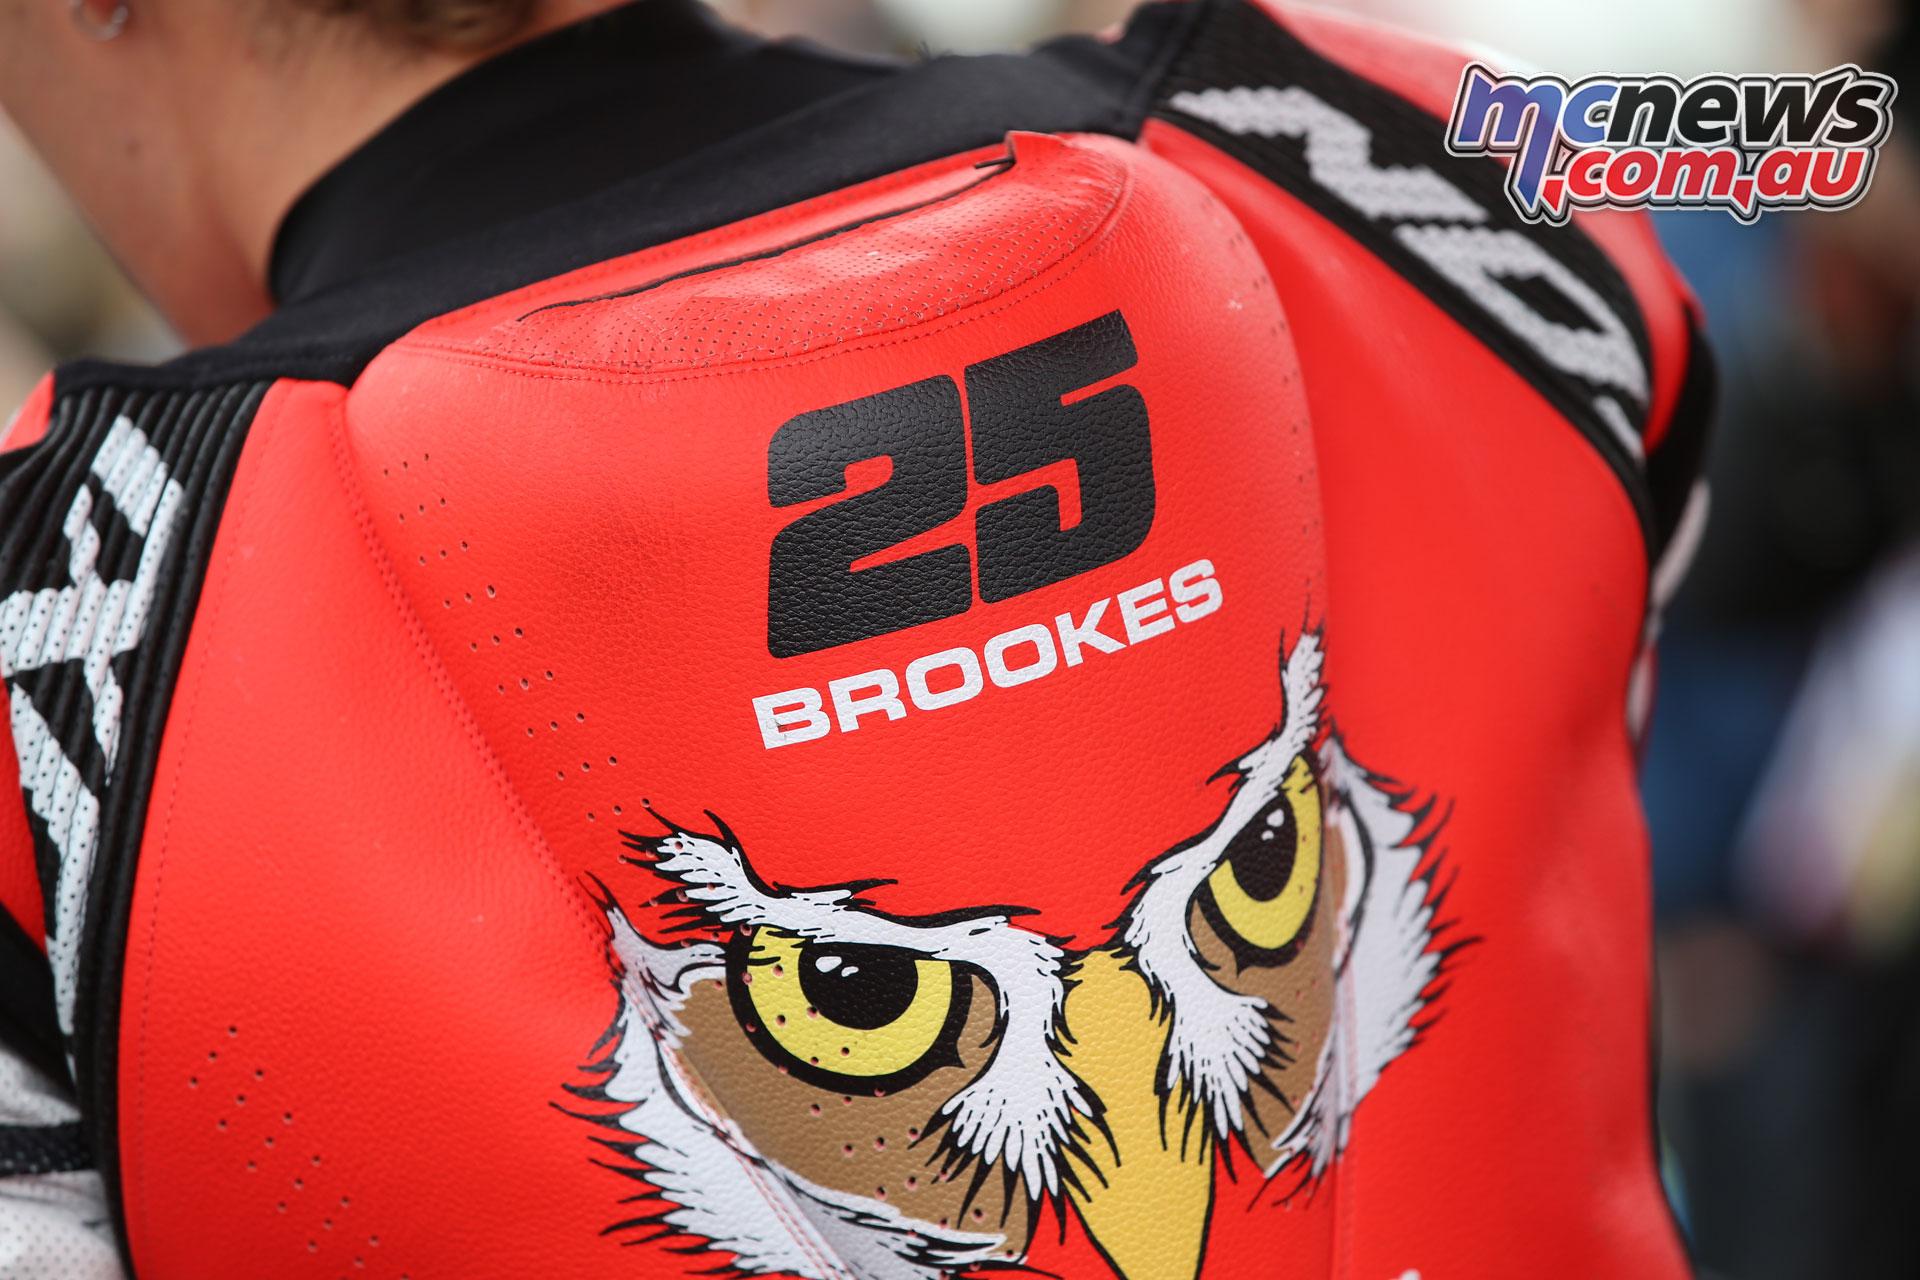 BSB Rnd BrandsHatch Josh Brookes AROA